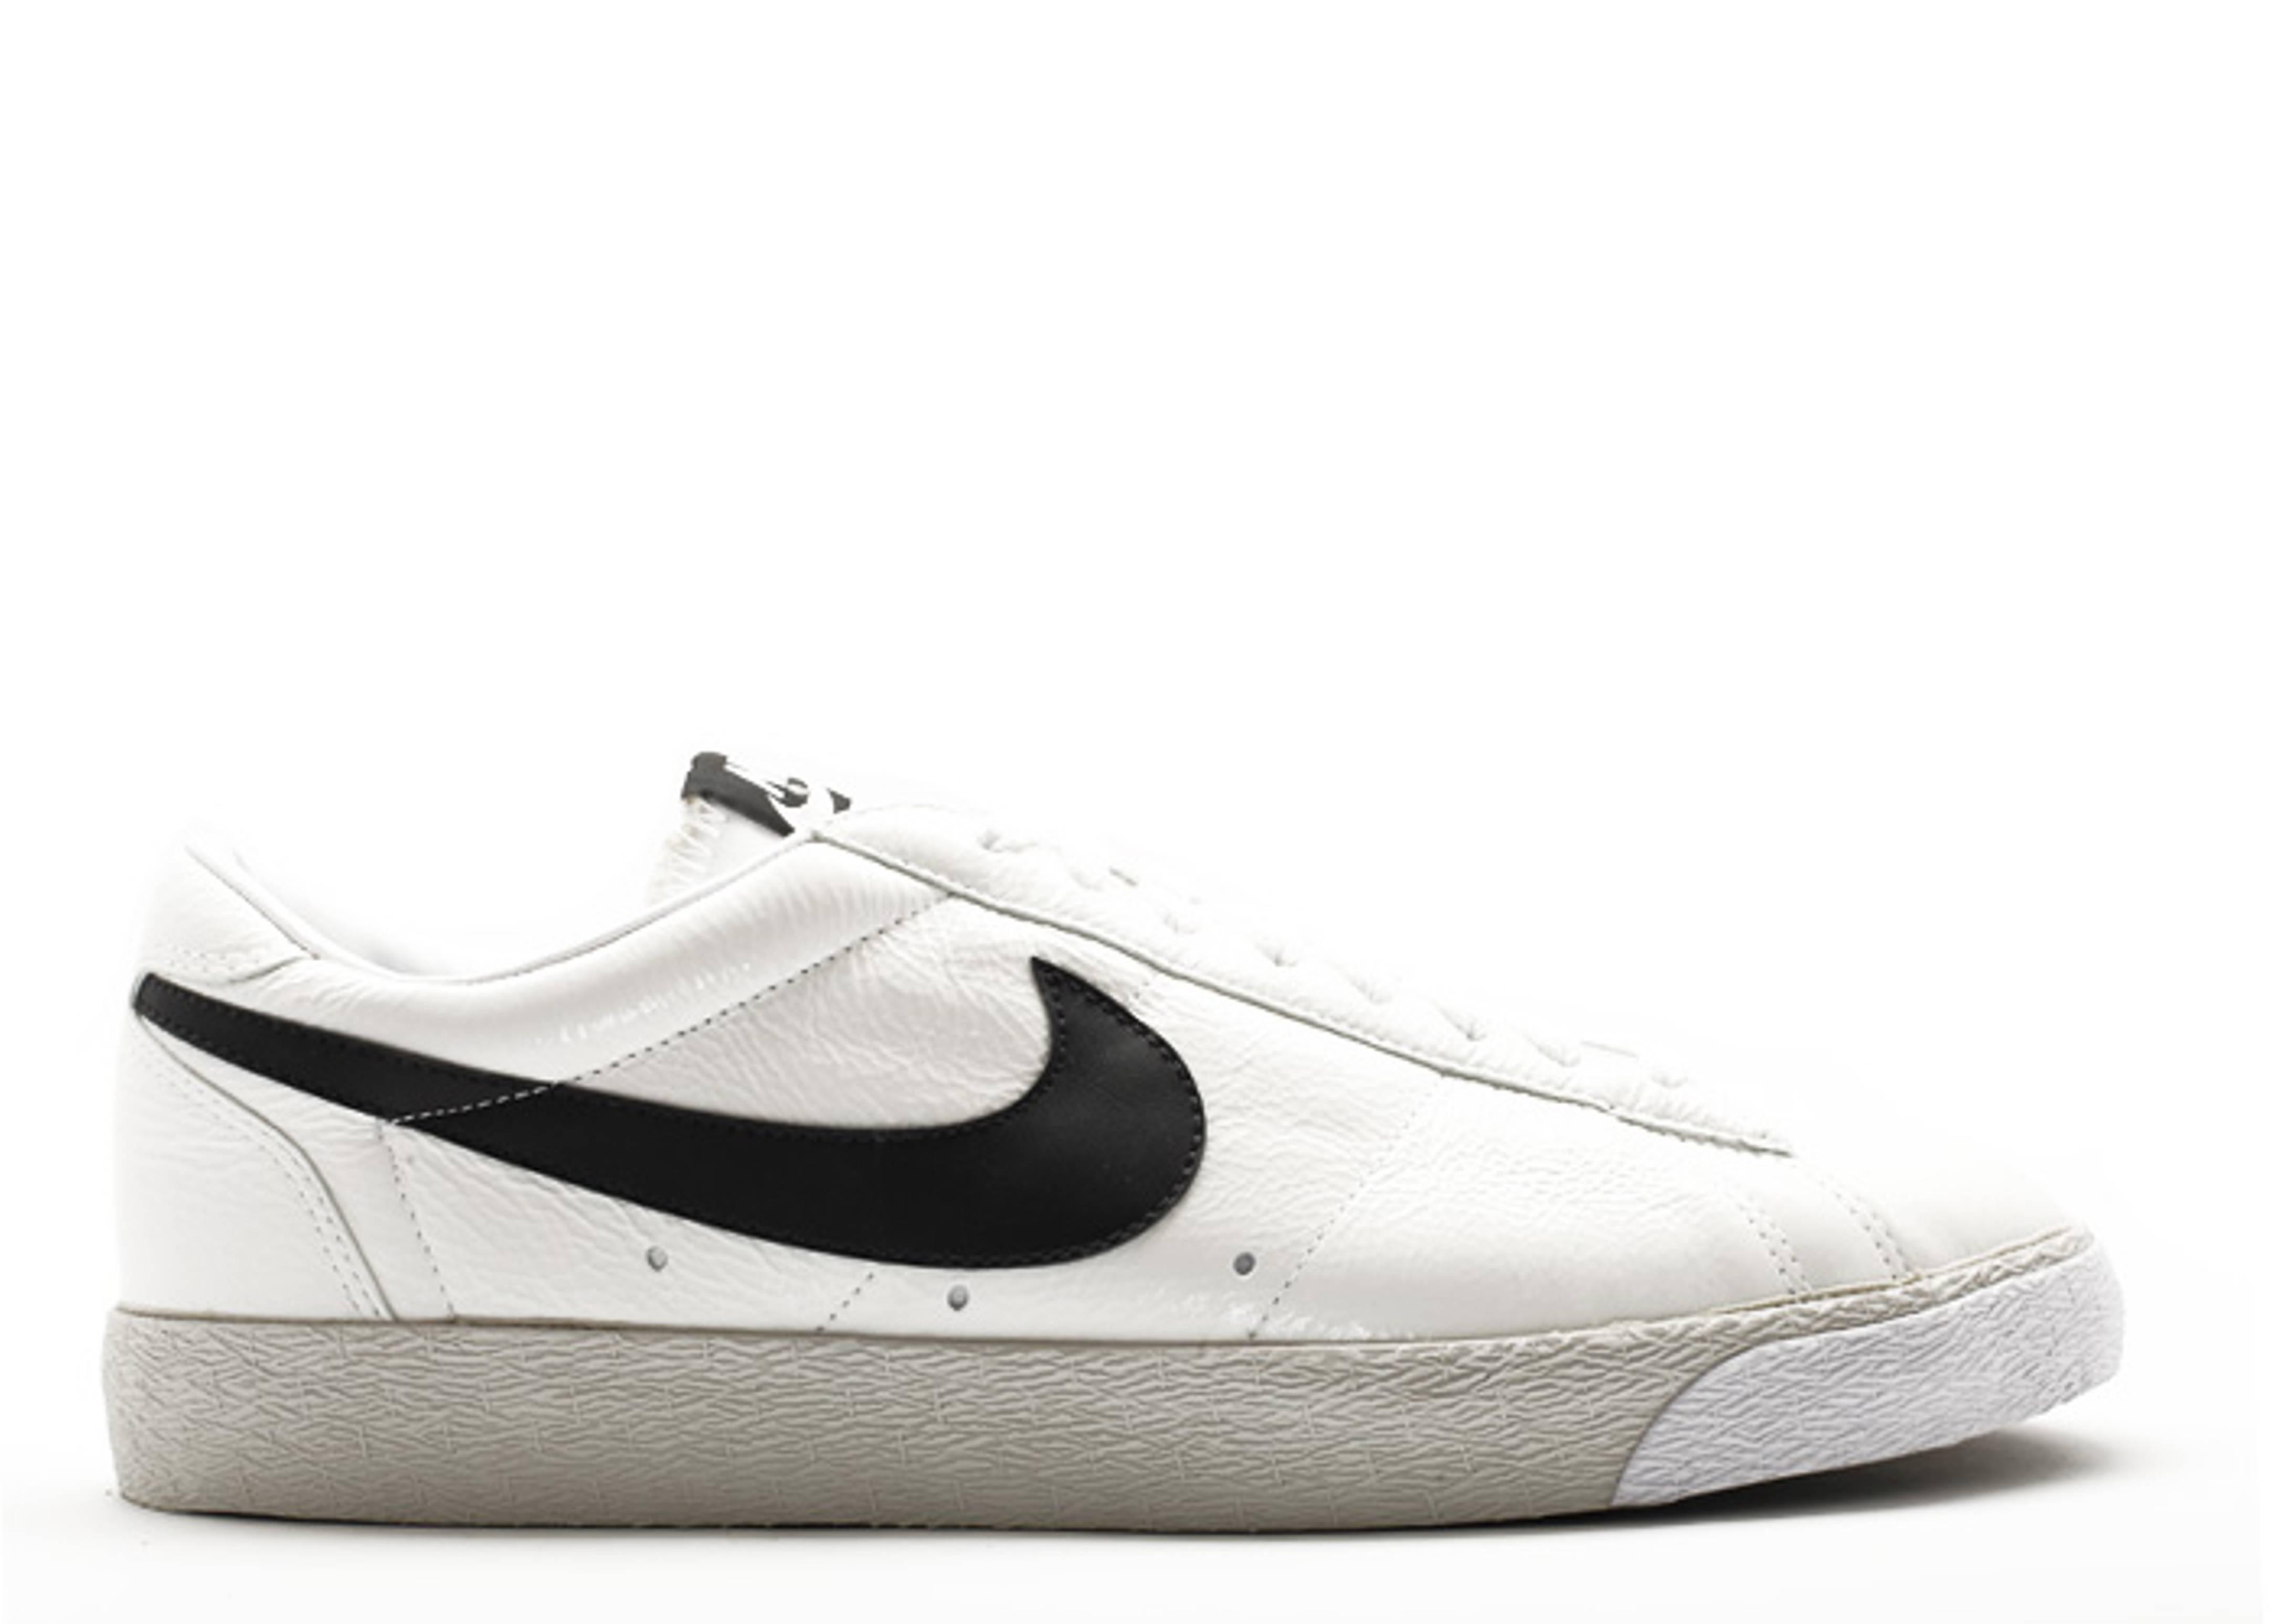 watch 76046 988d2 Blazer Low Classic Premium - Nike - 320509 101 - whiteblack-light bone   Flight Club